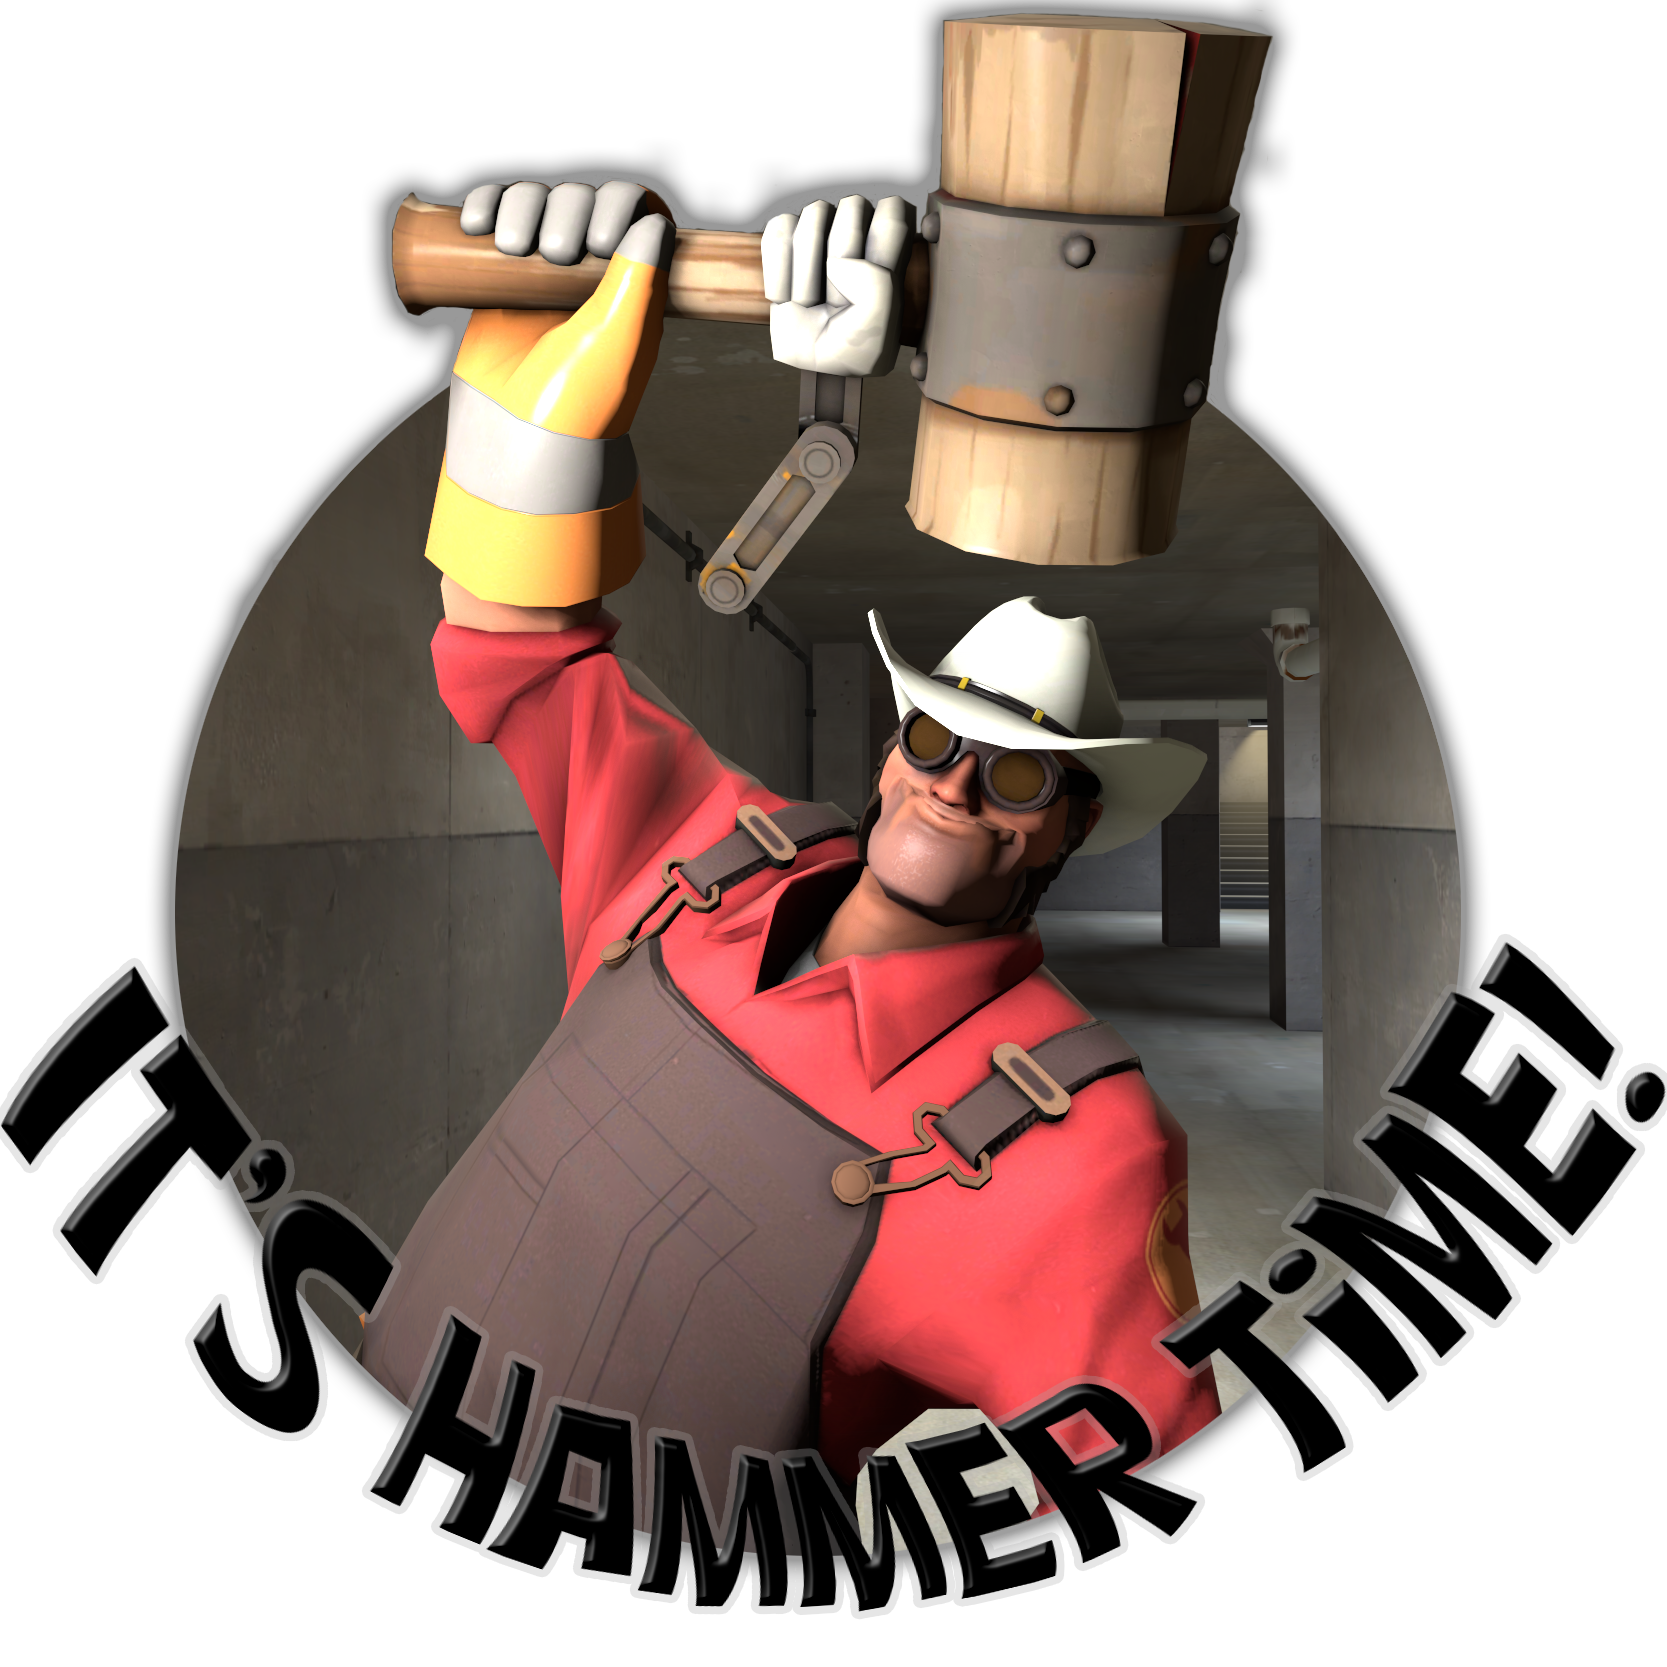 Hammer Time by Nikolad92